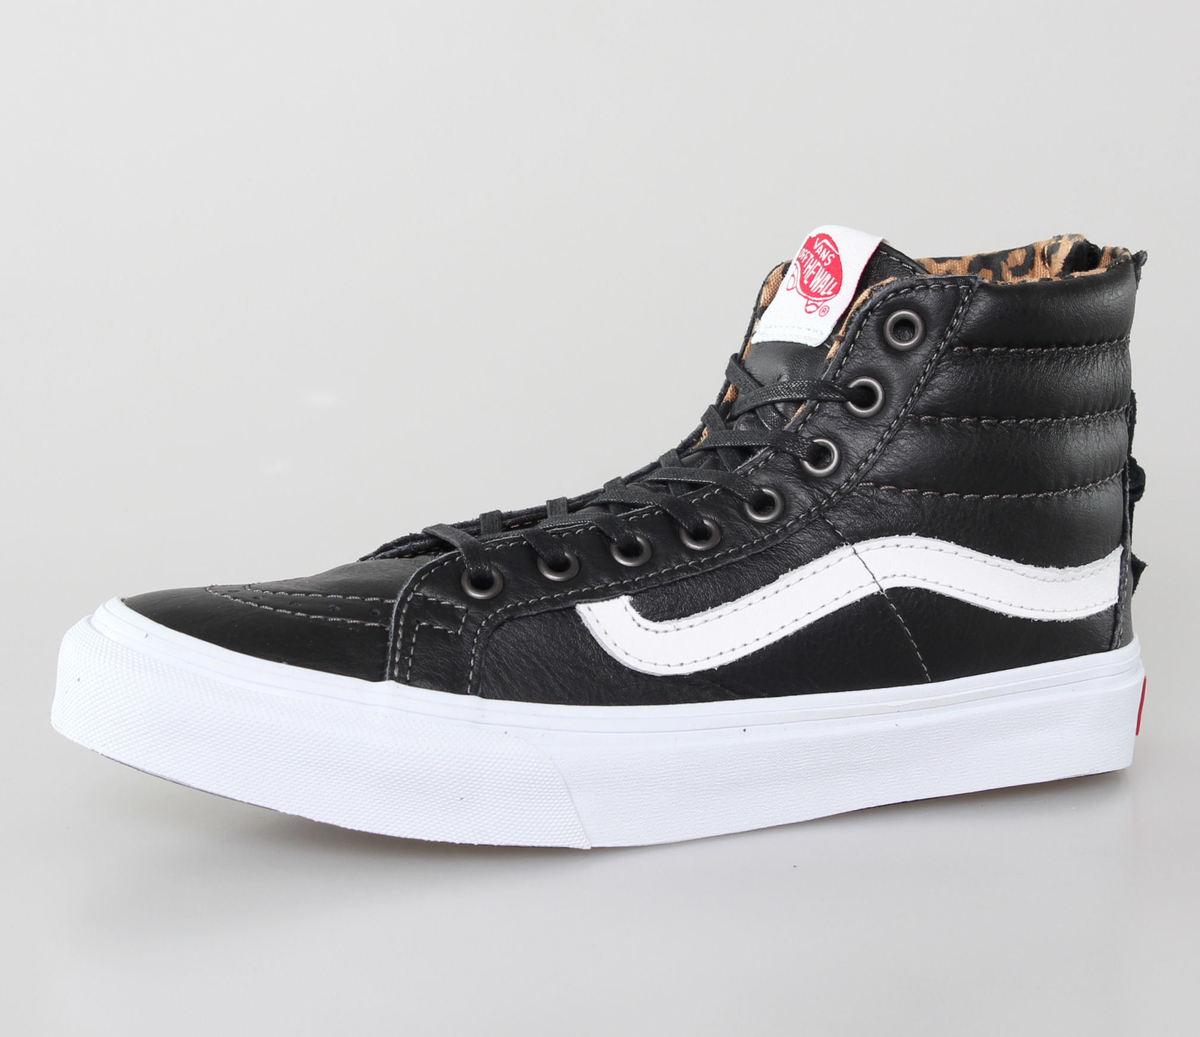 boty dámské VANS - U SK-Hi Slim Zip - Leather - BLACK-LEOPARD - VXH8DU1